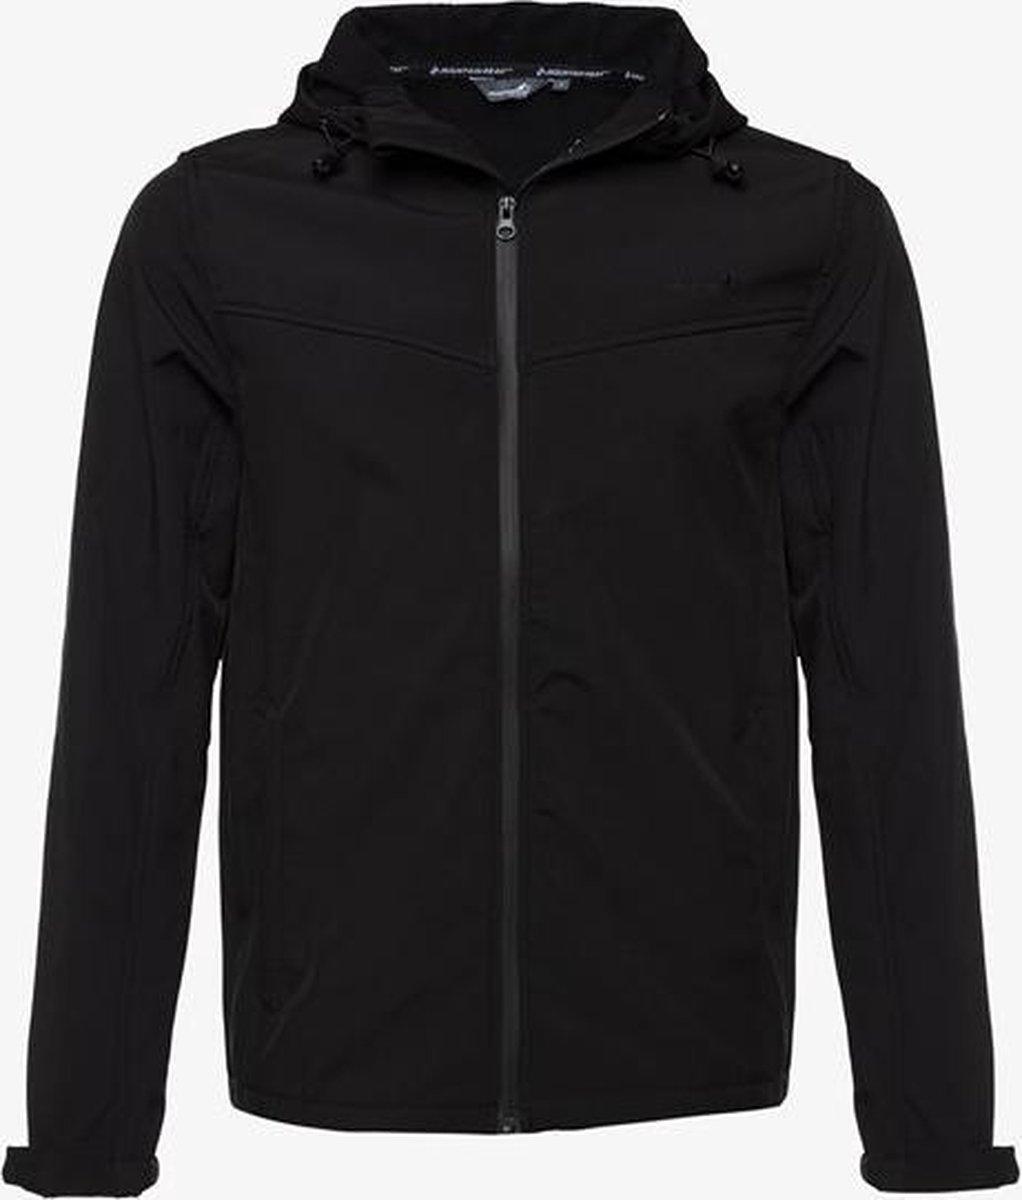 Mountain Peak heren outdoor softshell jas - Zwart - Maat L - Winddicht - Ademend materiaal